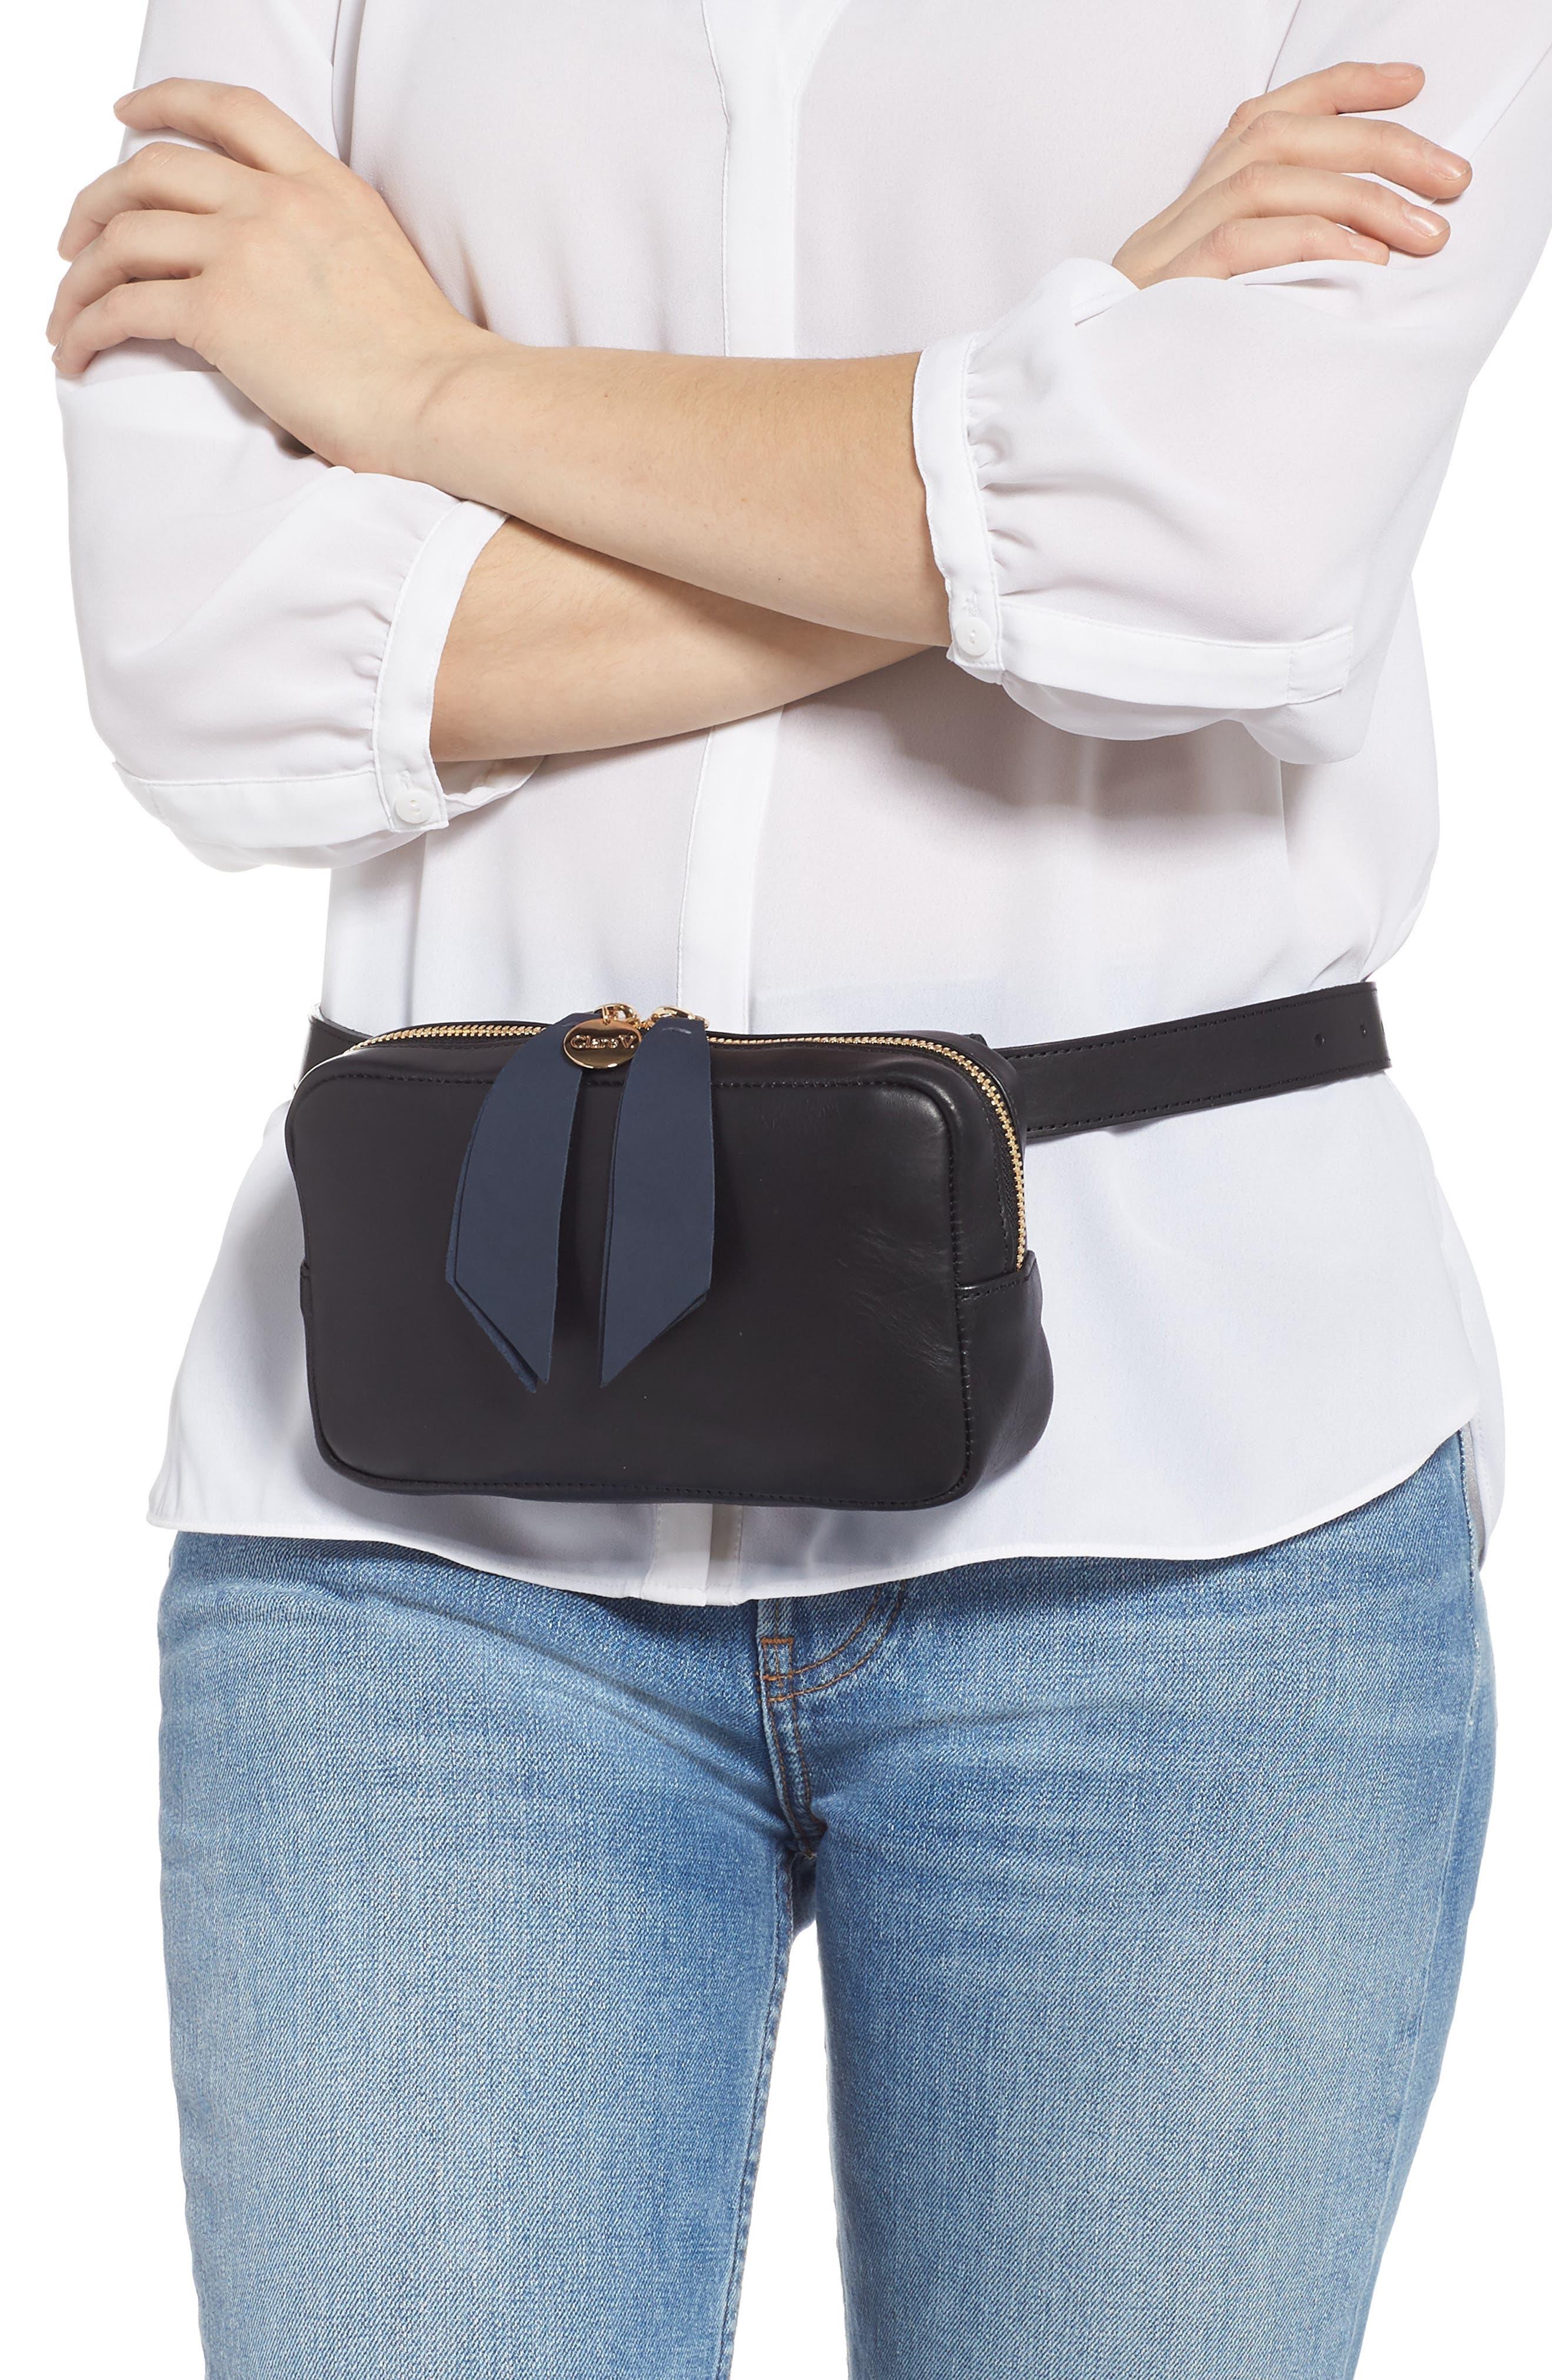 Le Belt Leather Convertible Crossbody Bag,                             Alternate thumbnail 2, color,                             BLACK VEGAN